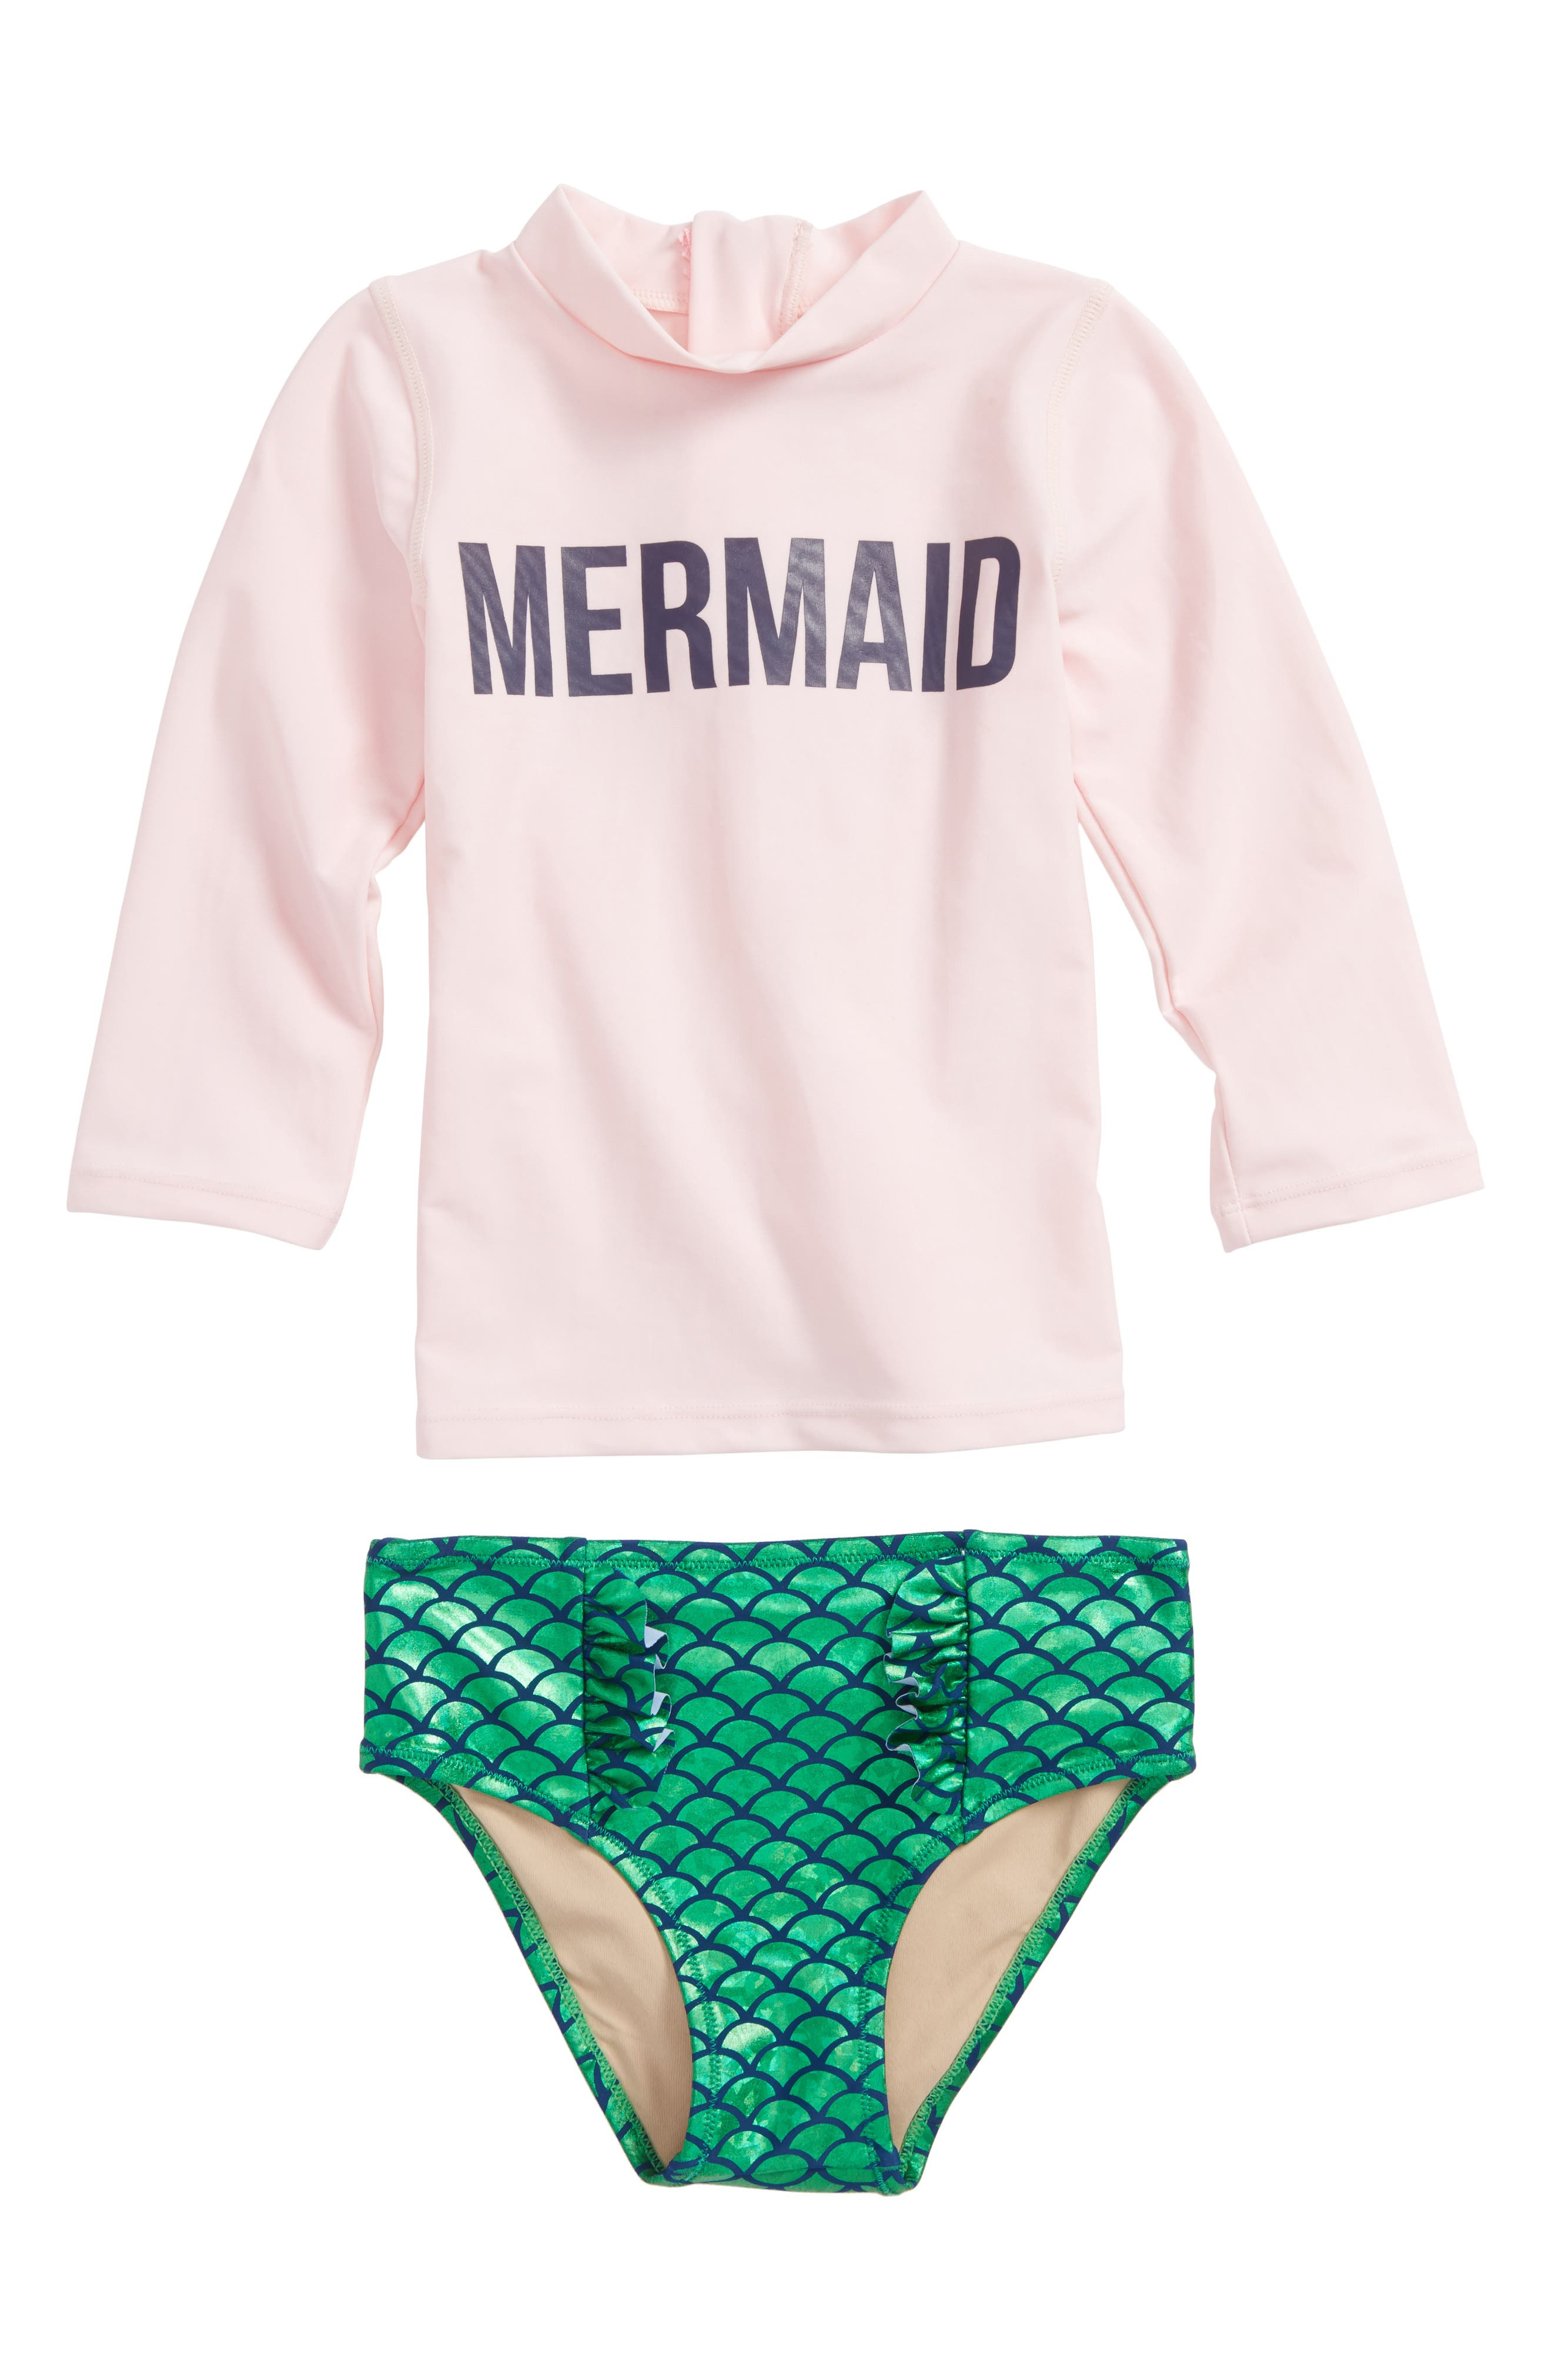 Magic Mermaid Two-Piece Rashguard Swimsuit,                             Main thumbnail 1, color,                             Pink